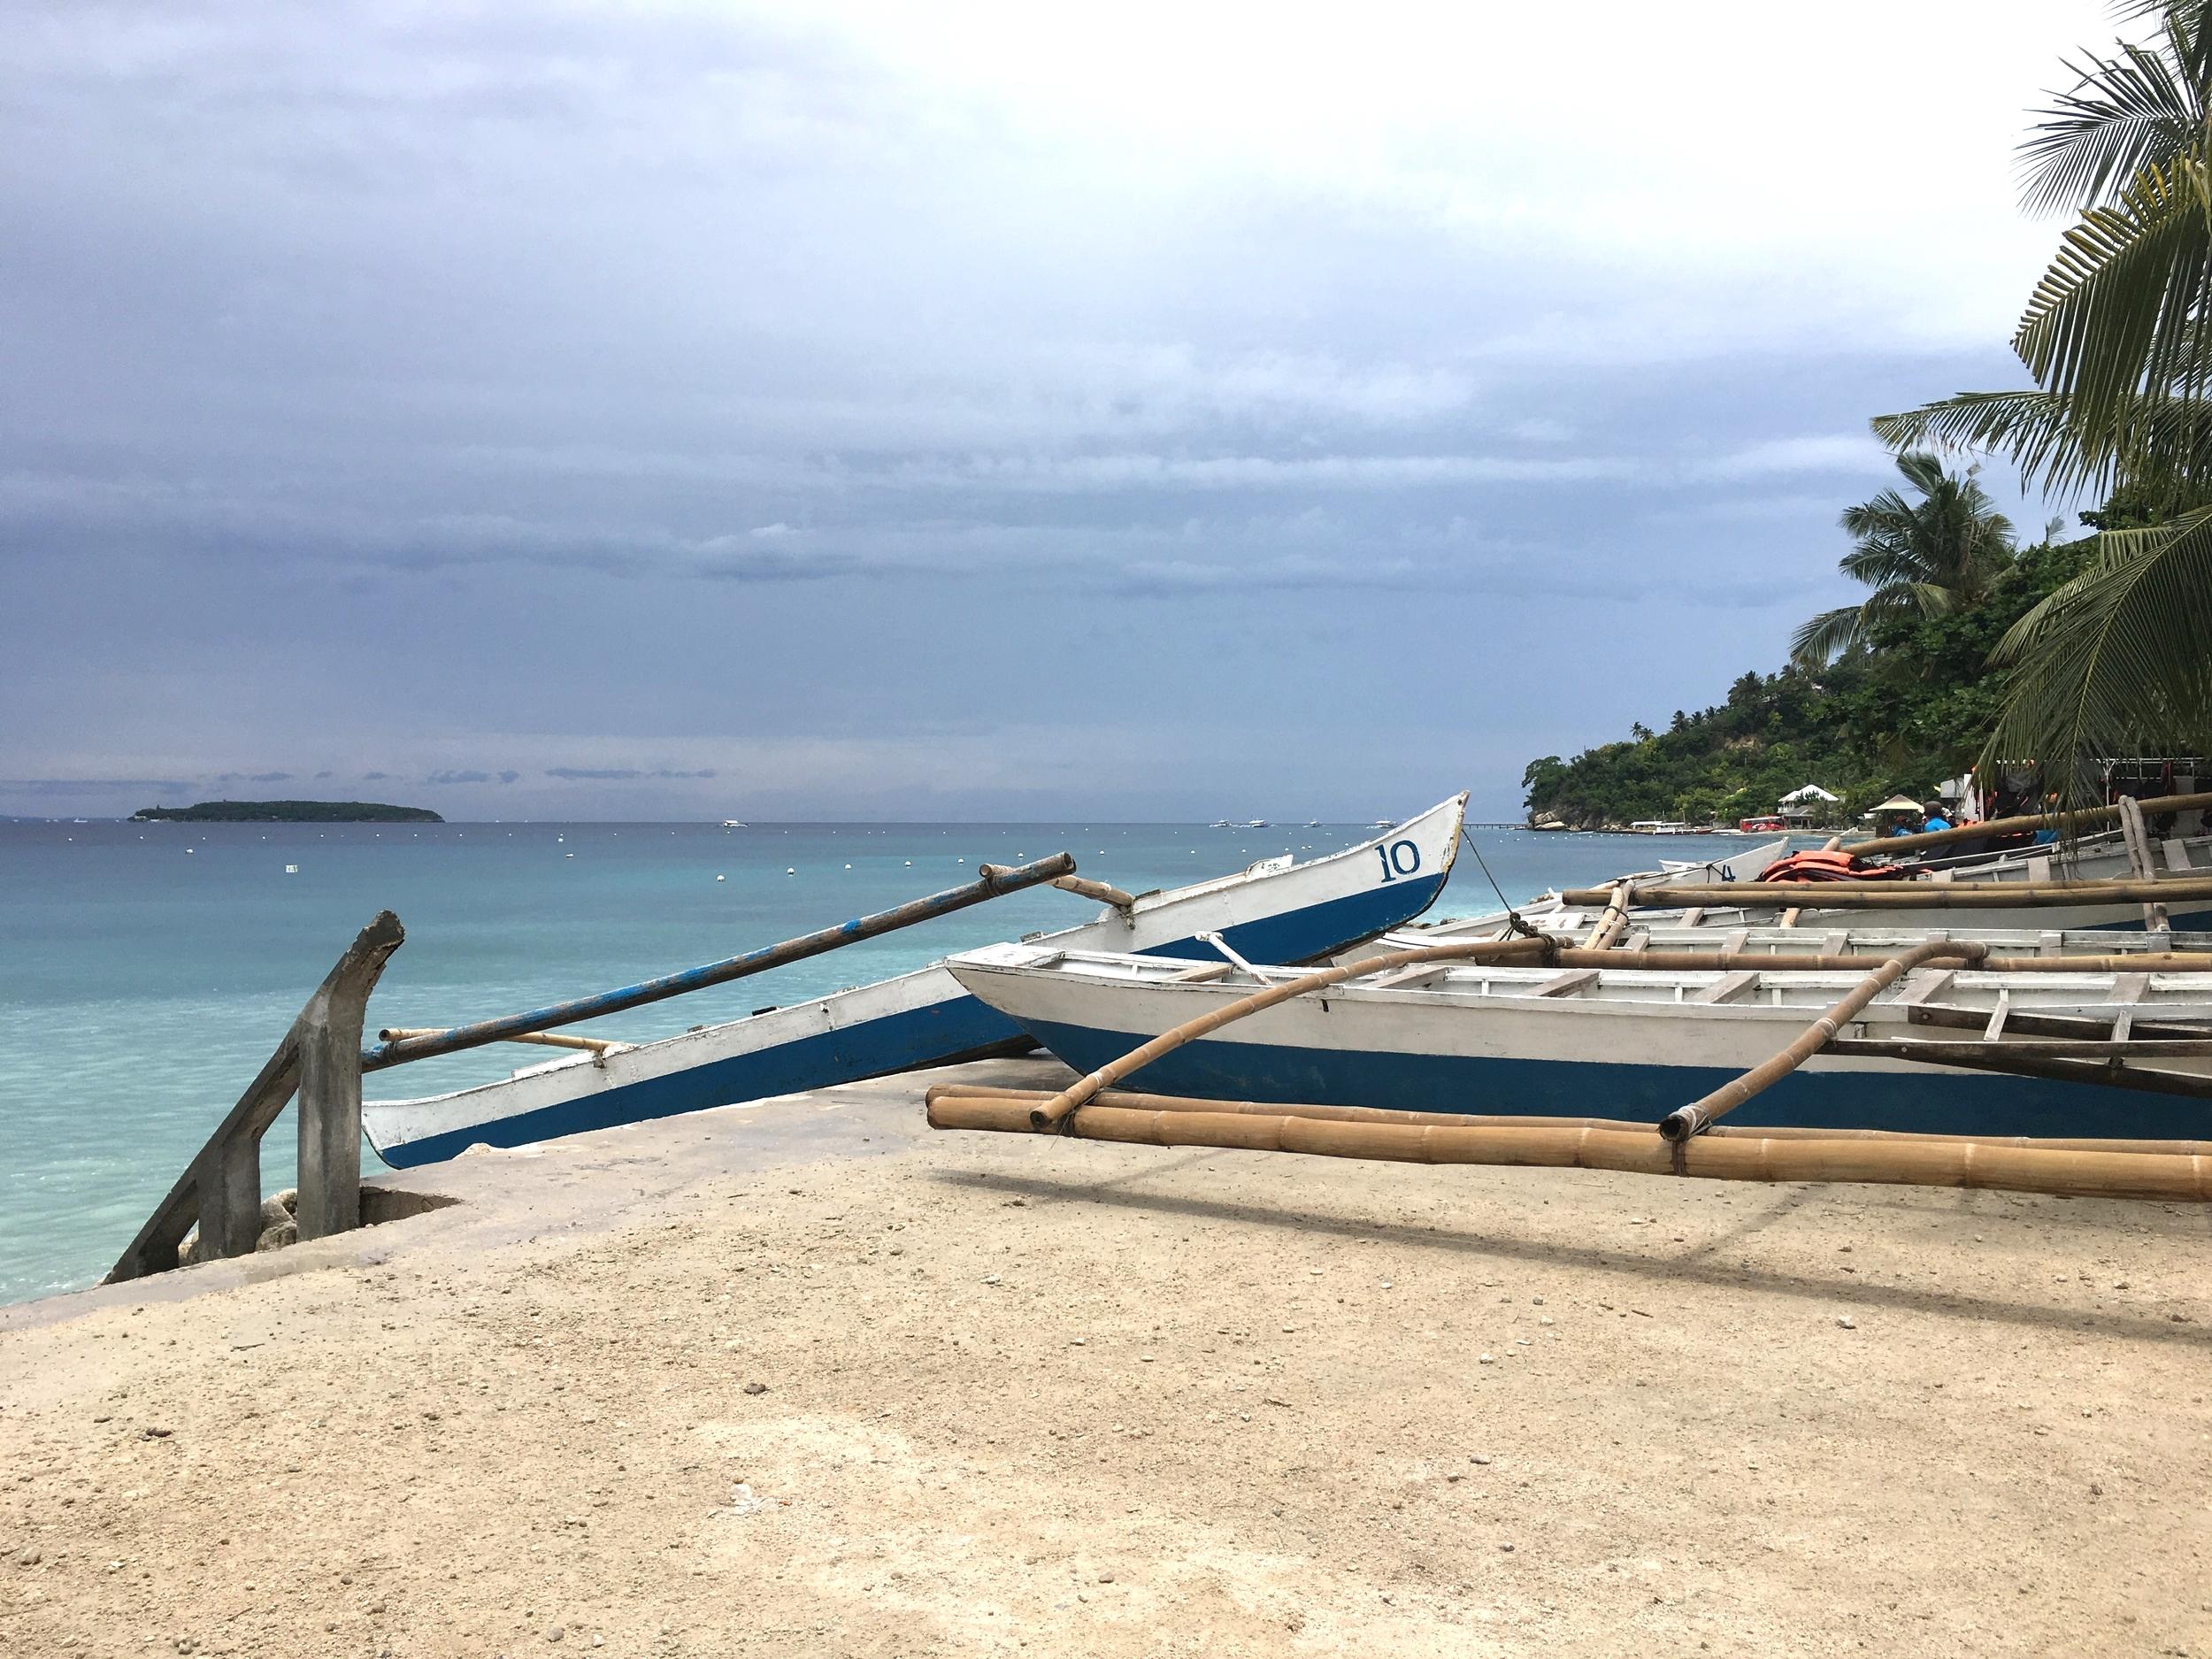 Oslob, a providence of Cebu (visiting the Whale Sharks!).